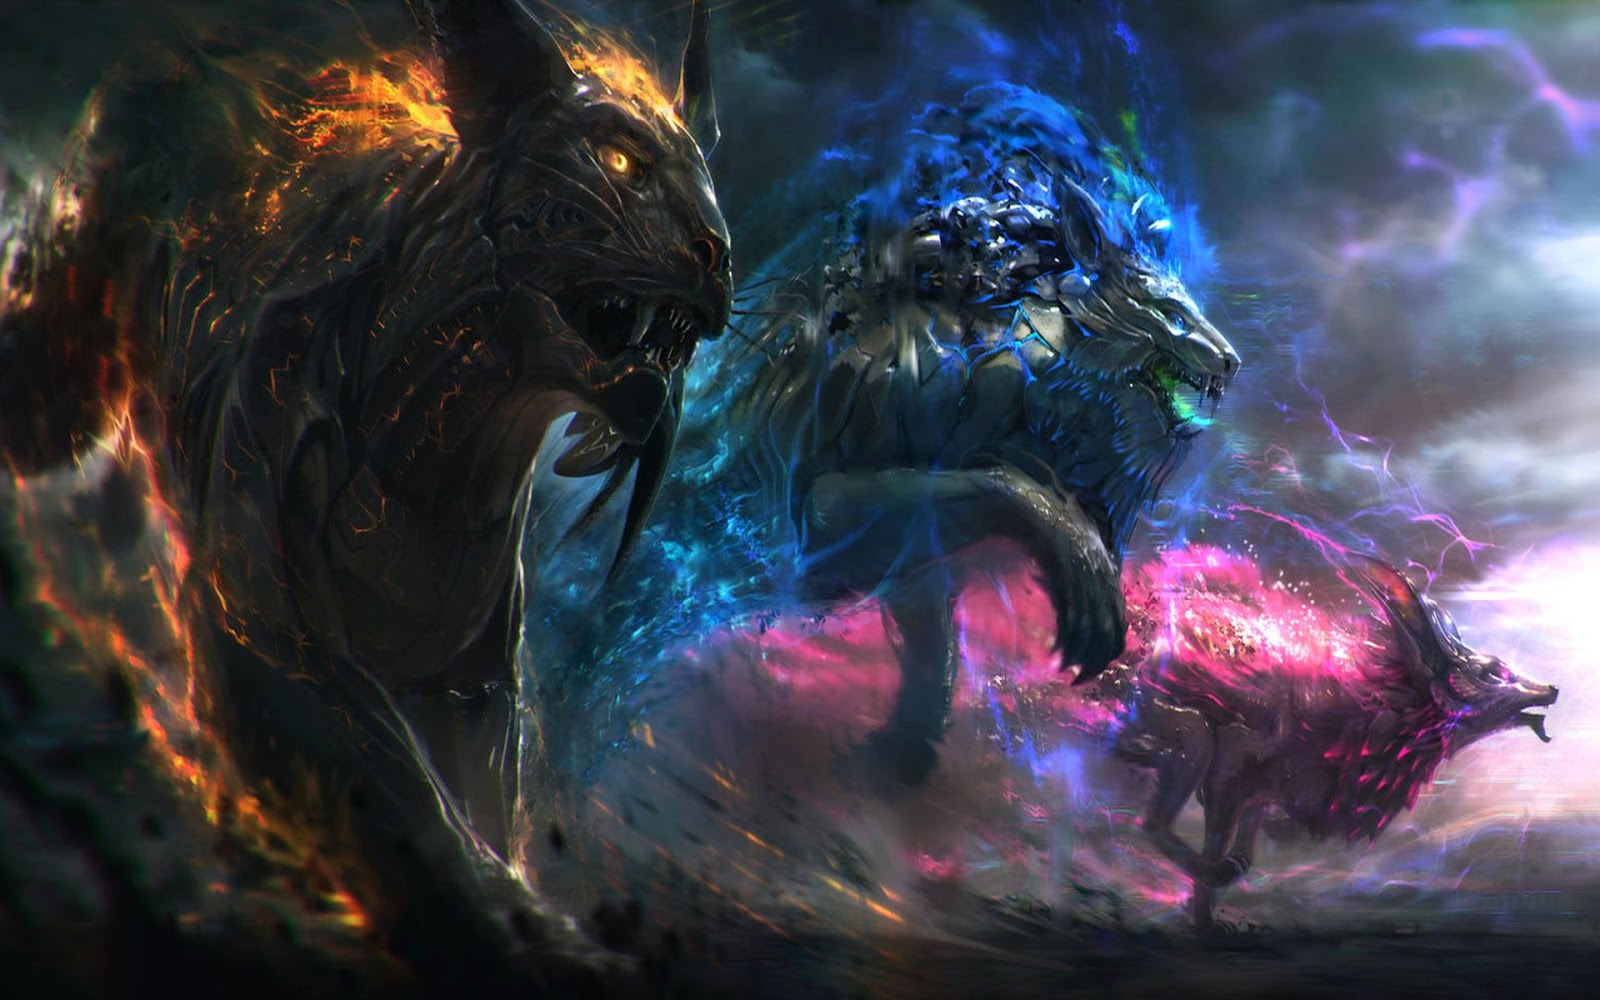 Fantasy wildlife abstract animal creative design art hd - Graphic design desktop wallpaper hd ...